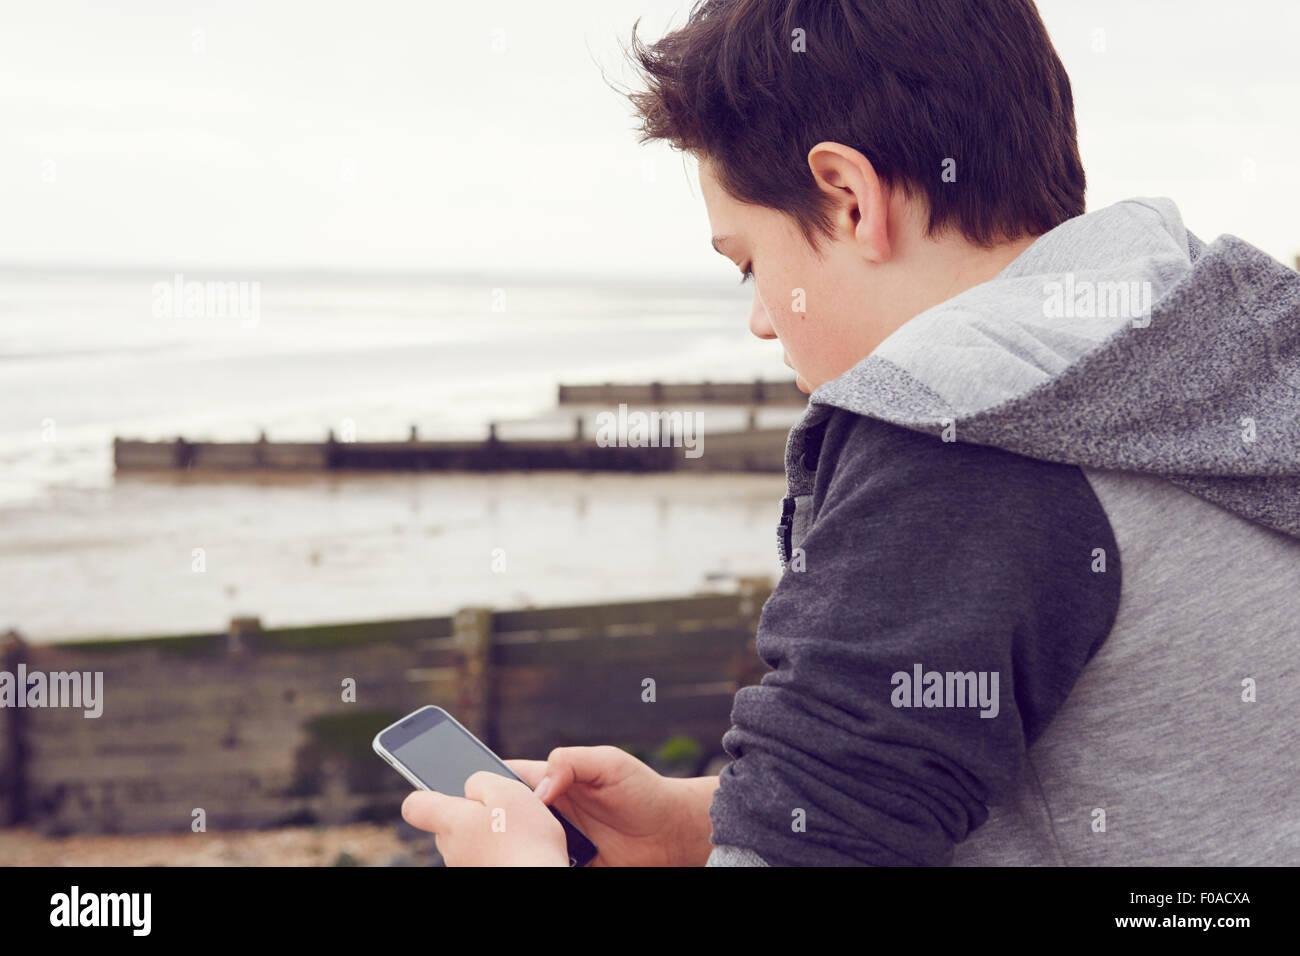 Teenage boy at seaside texting on smartphone, Southend on Sea, Essex, UK - Stock Image